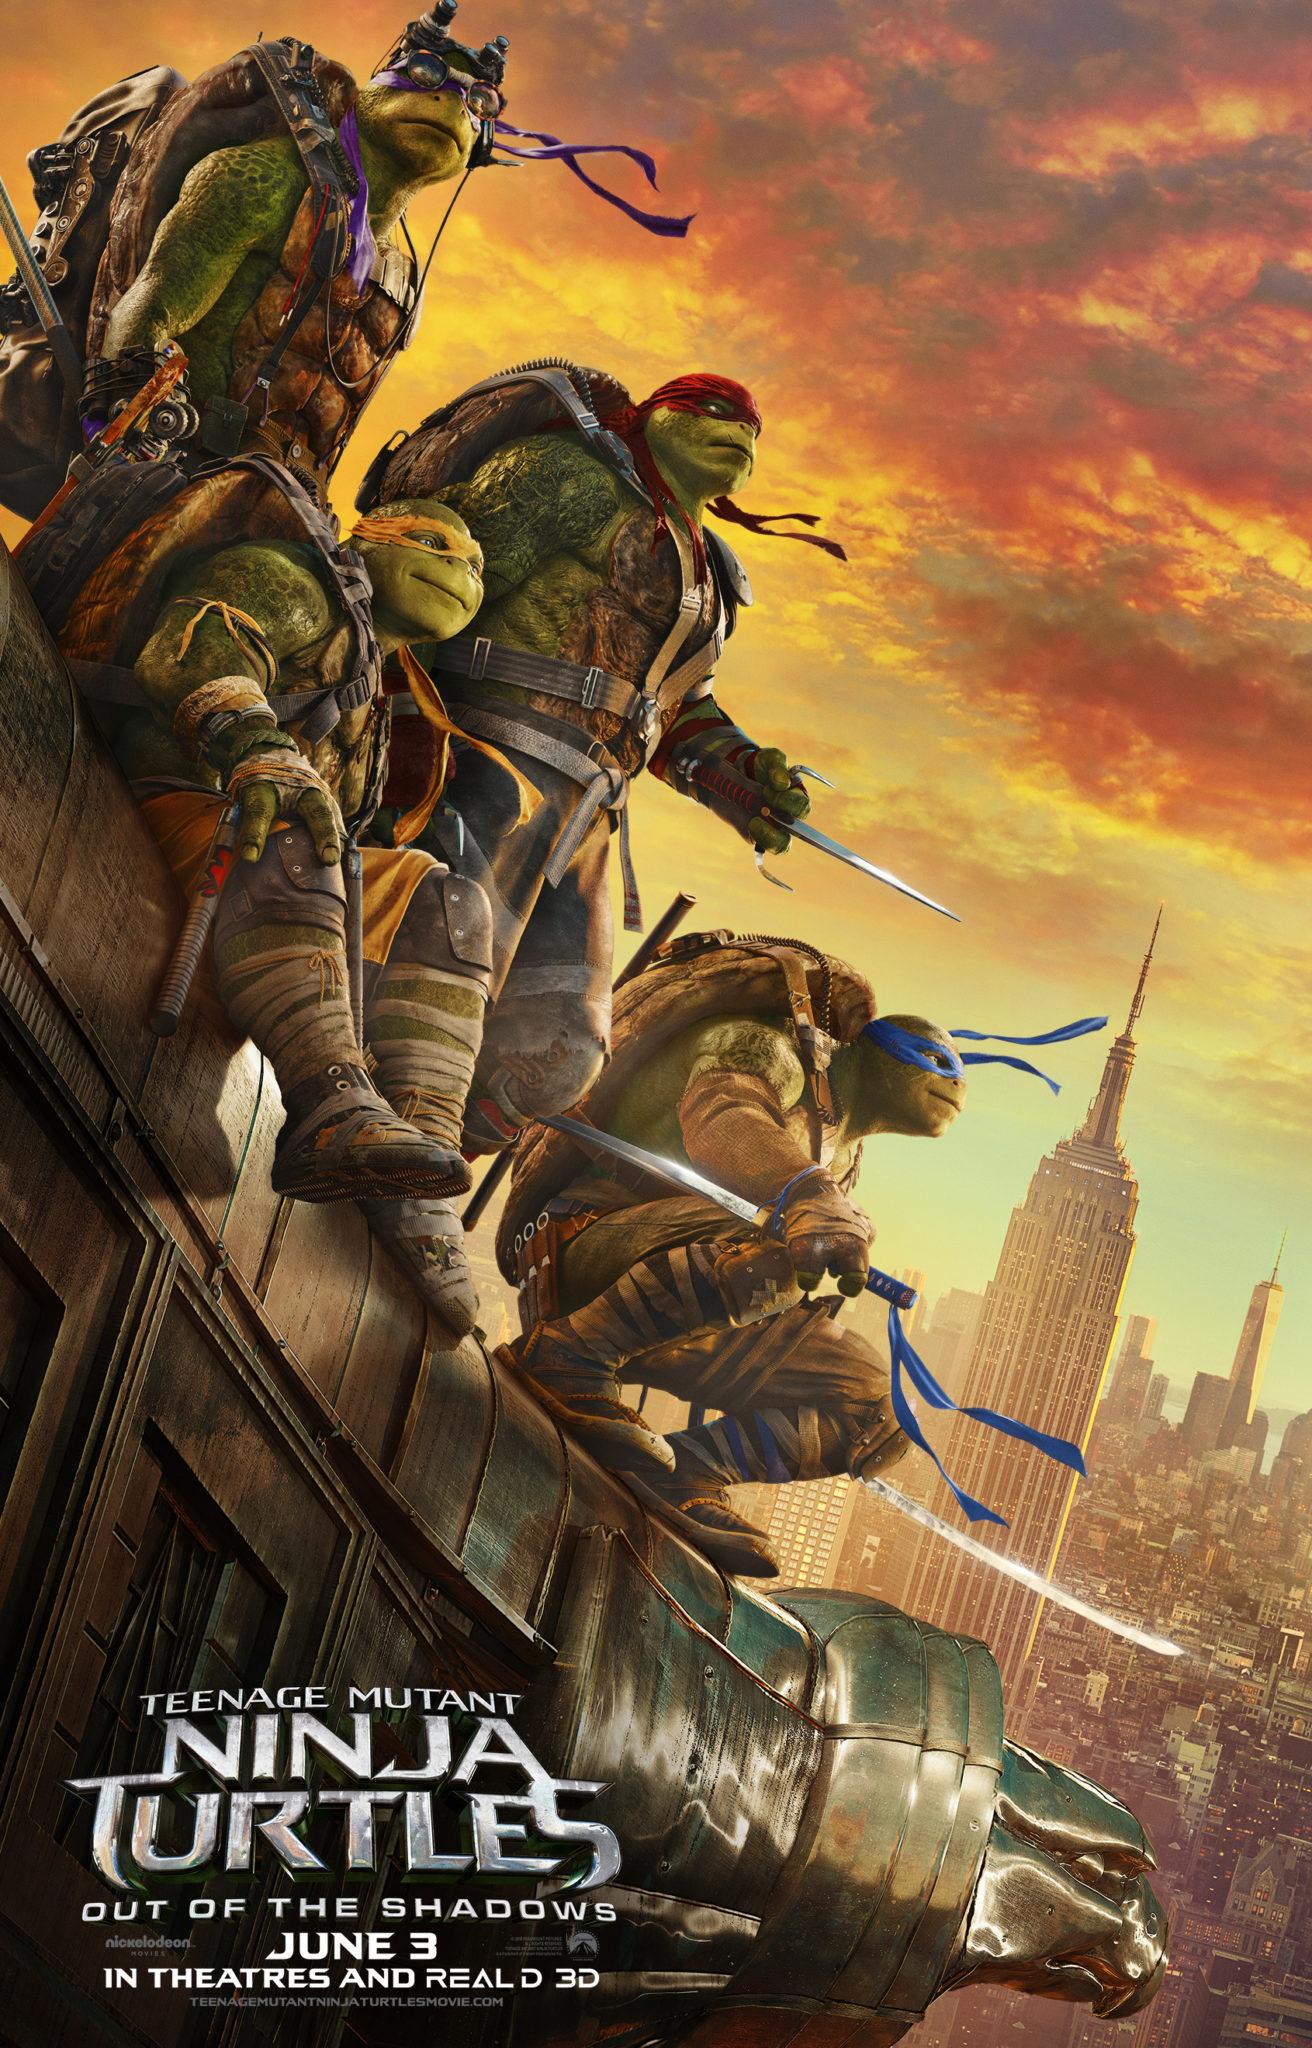 New Movie: Teenage Mutant Ninja Turtles: Out of the Shadows